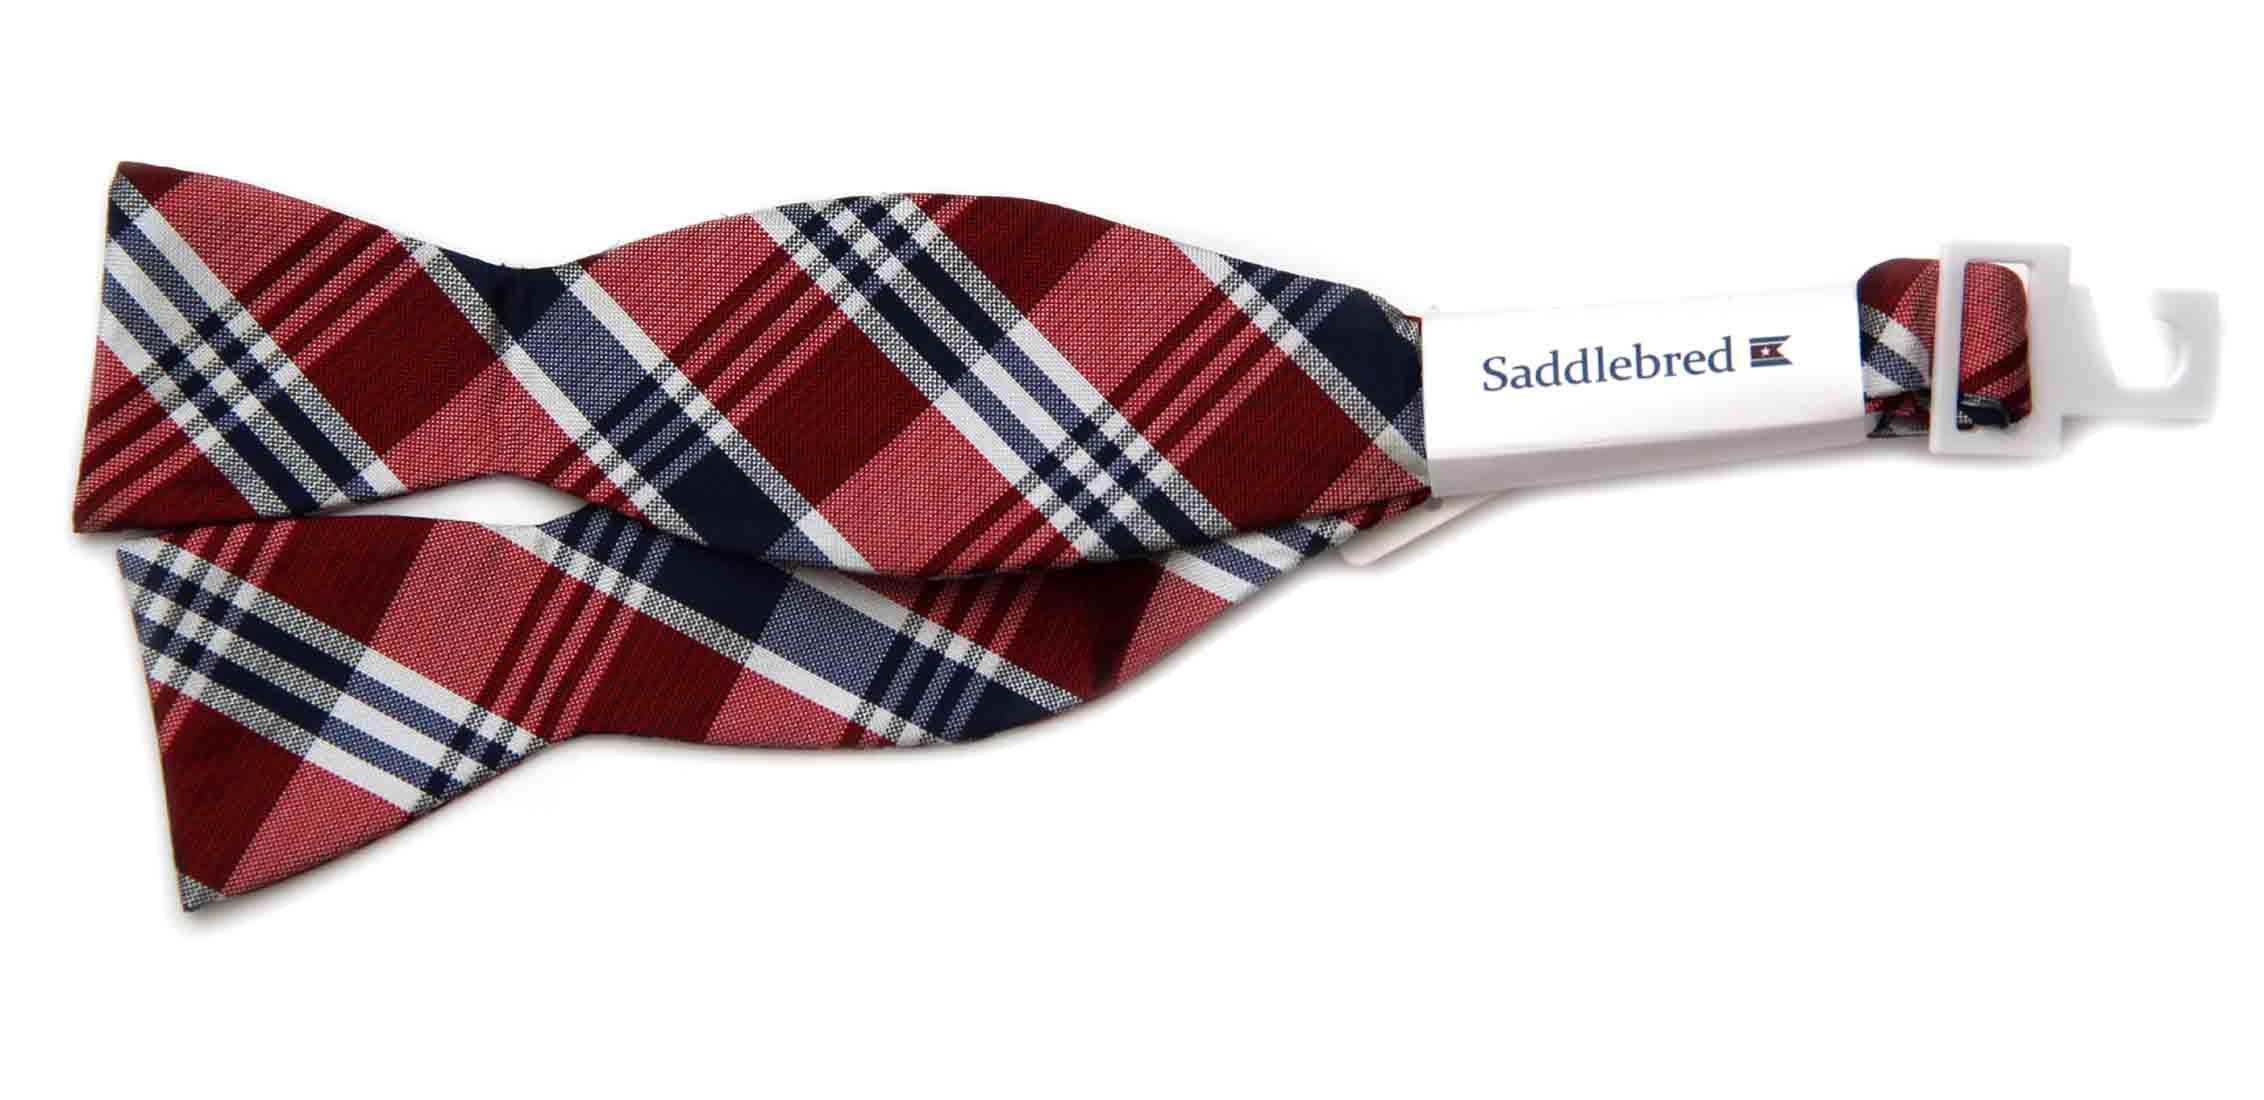 Saddlebred Silk Bow Tie Navy Blue Red White Gray Plaid Men's